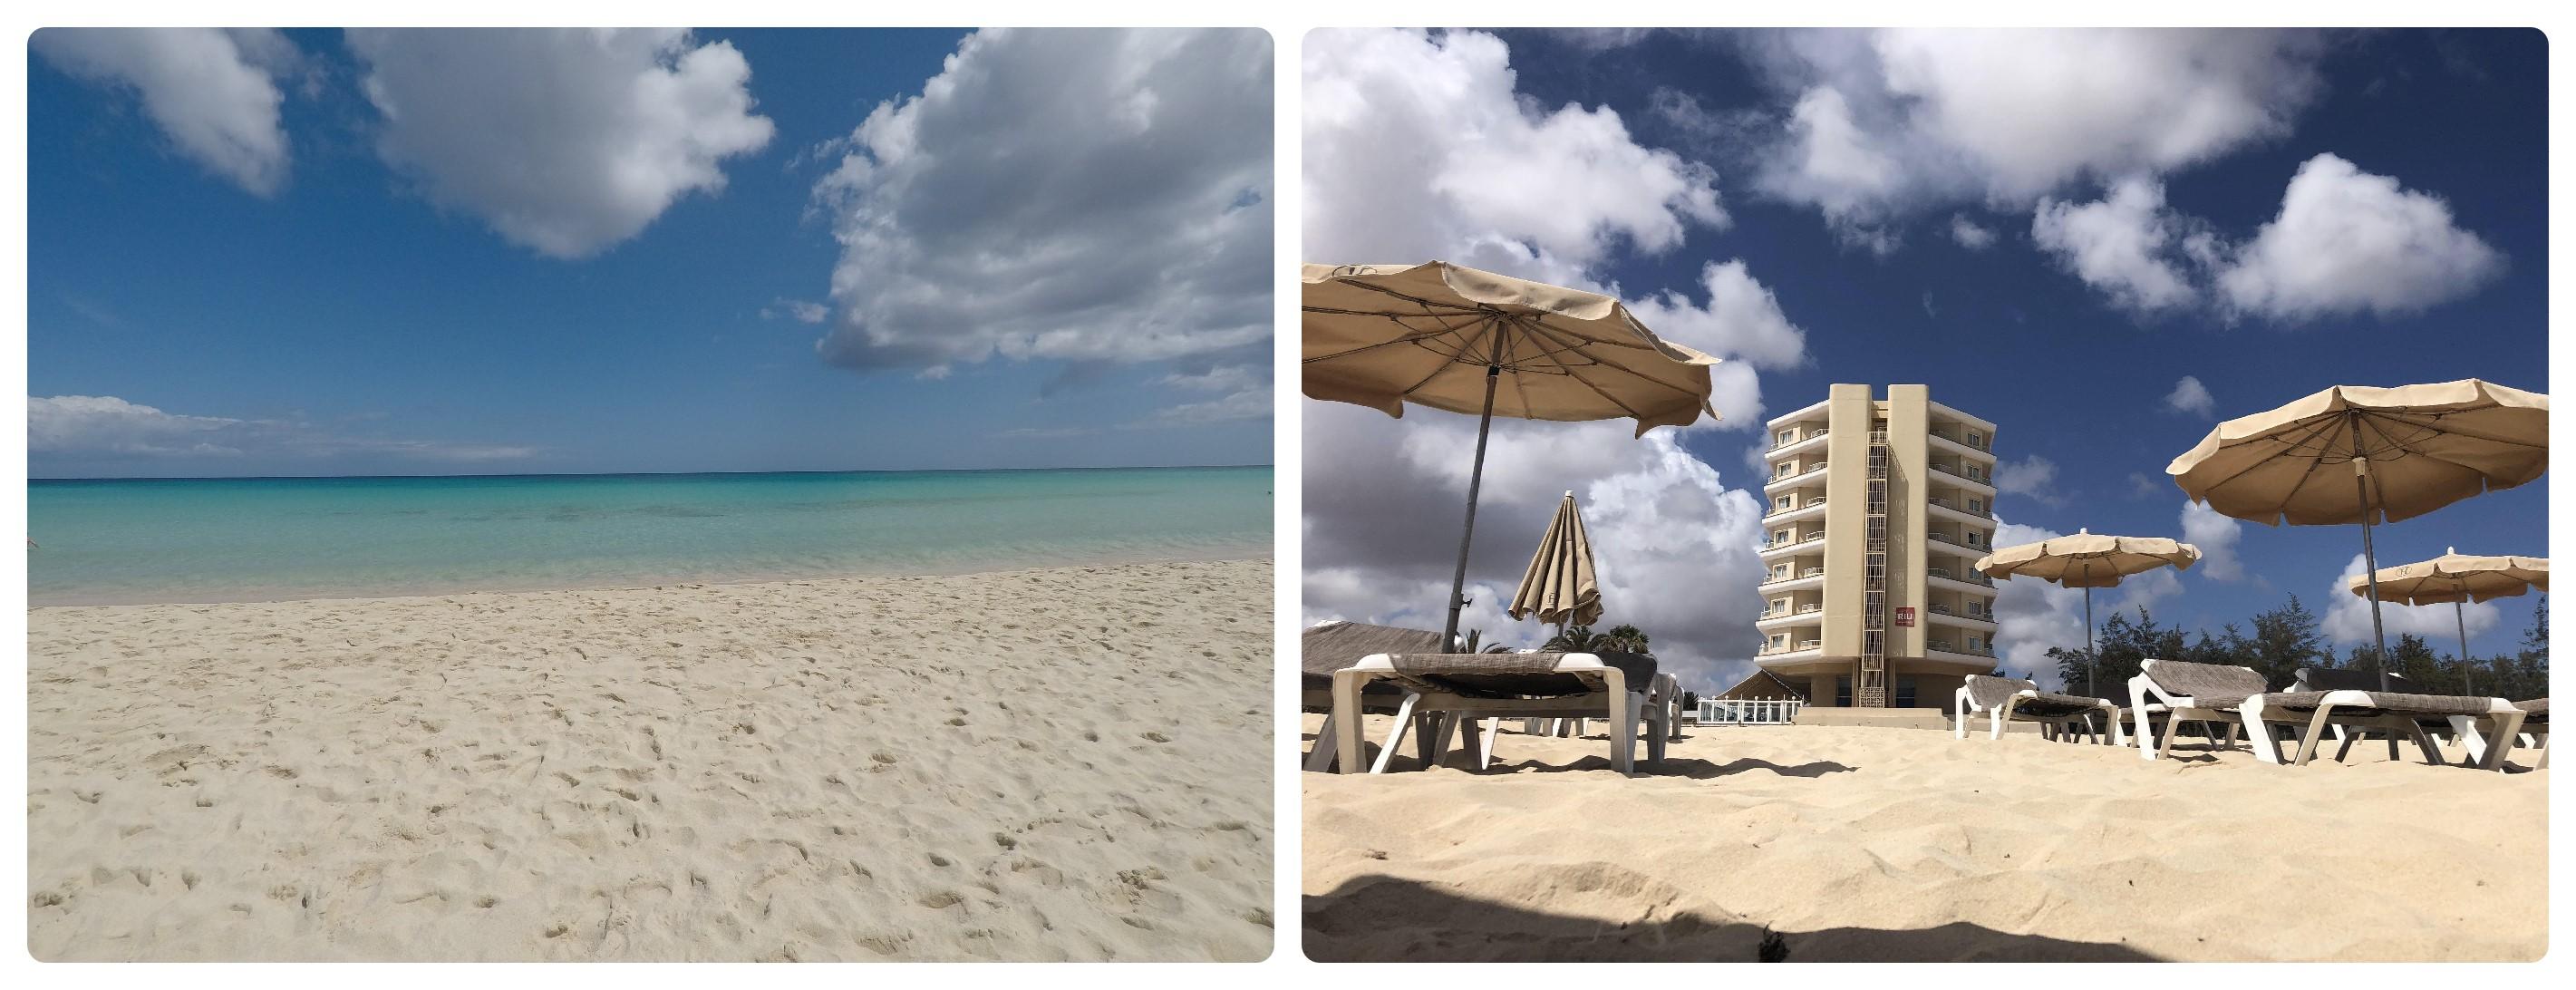 Strand mit Riu Hotel